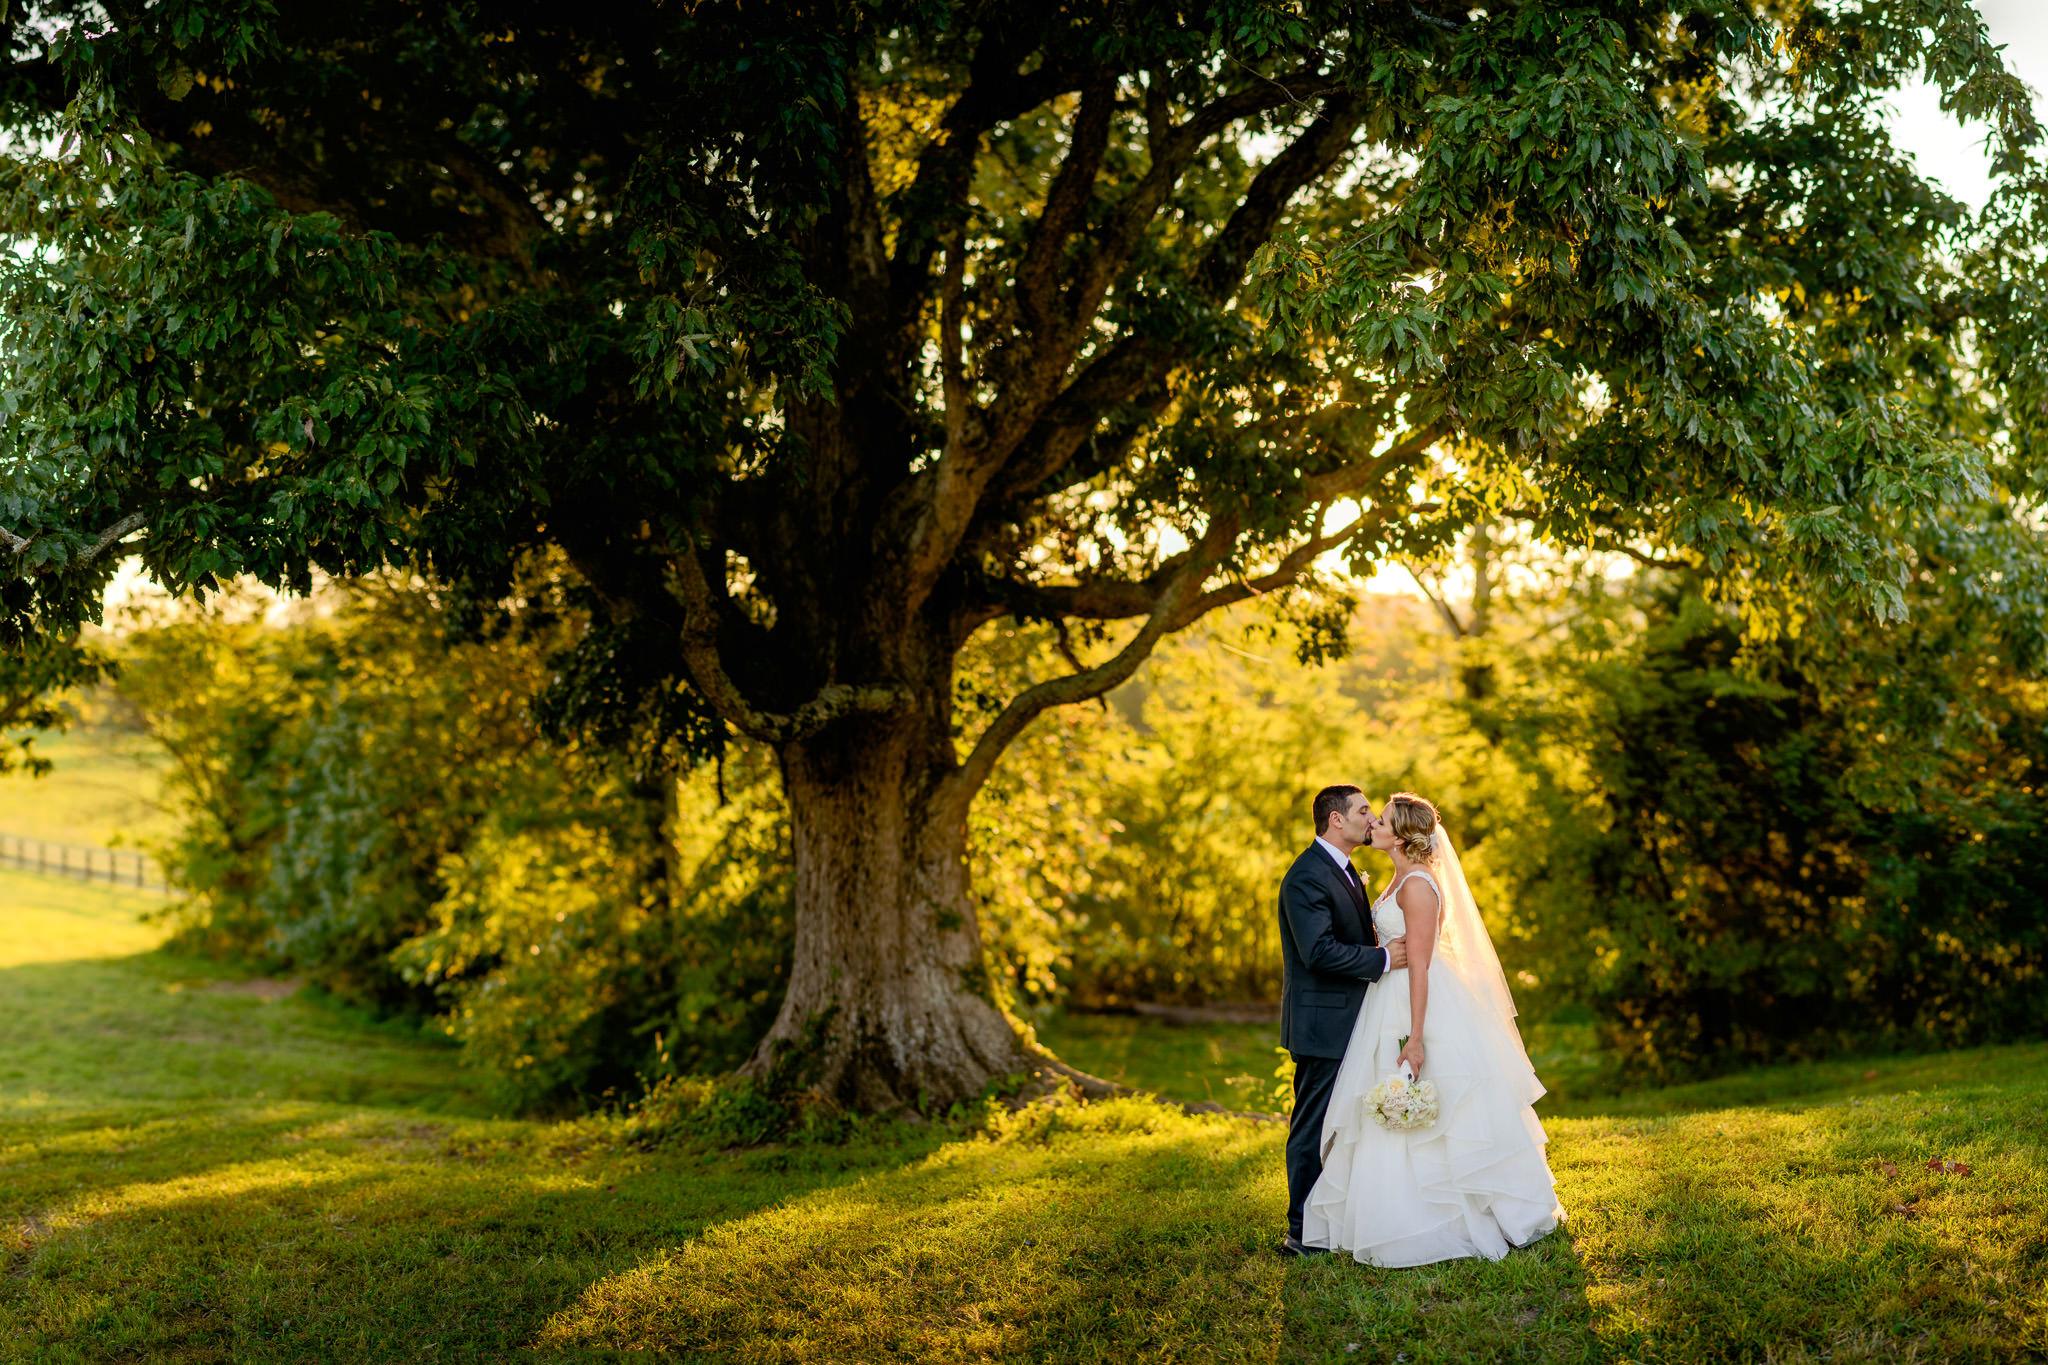 Greg and Jess Photography Nashville Portrait and Wedding Photographer 51.jpg